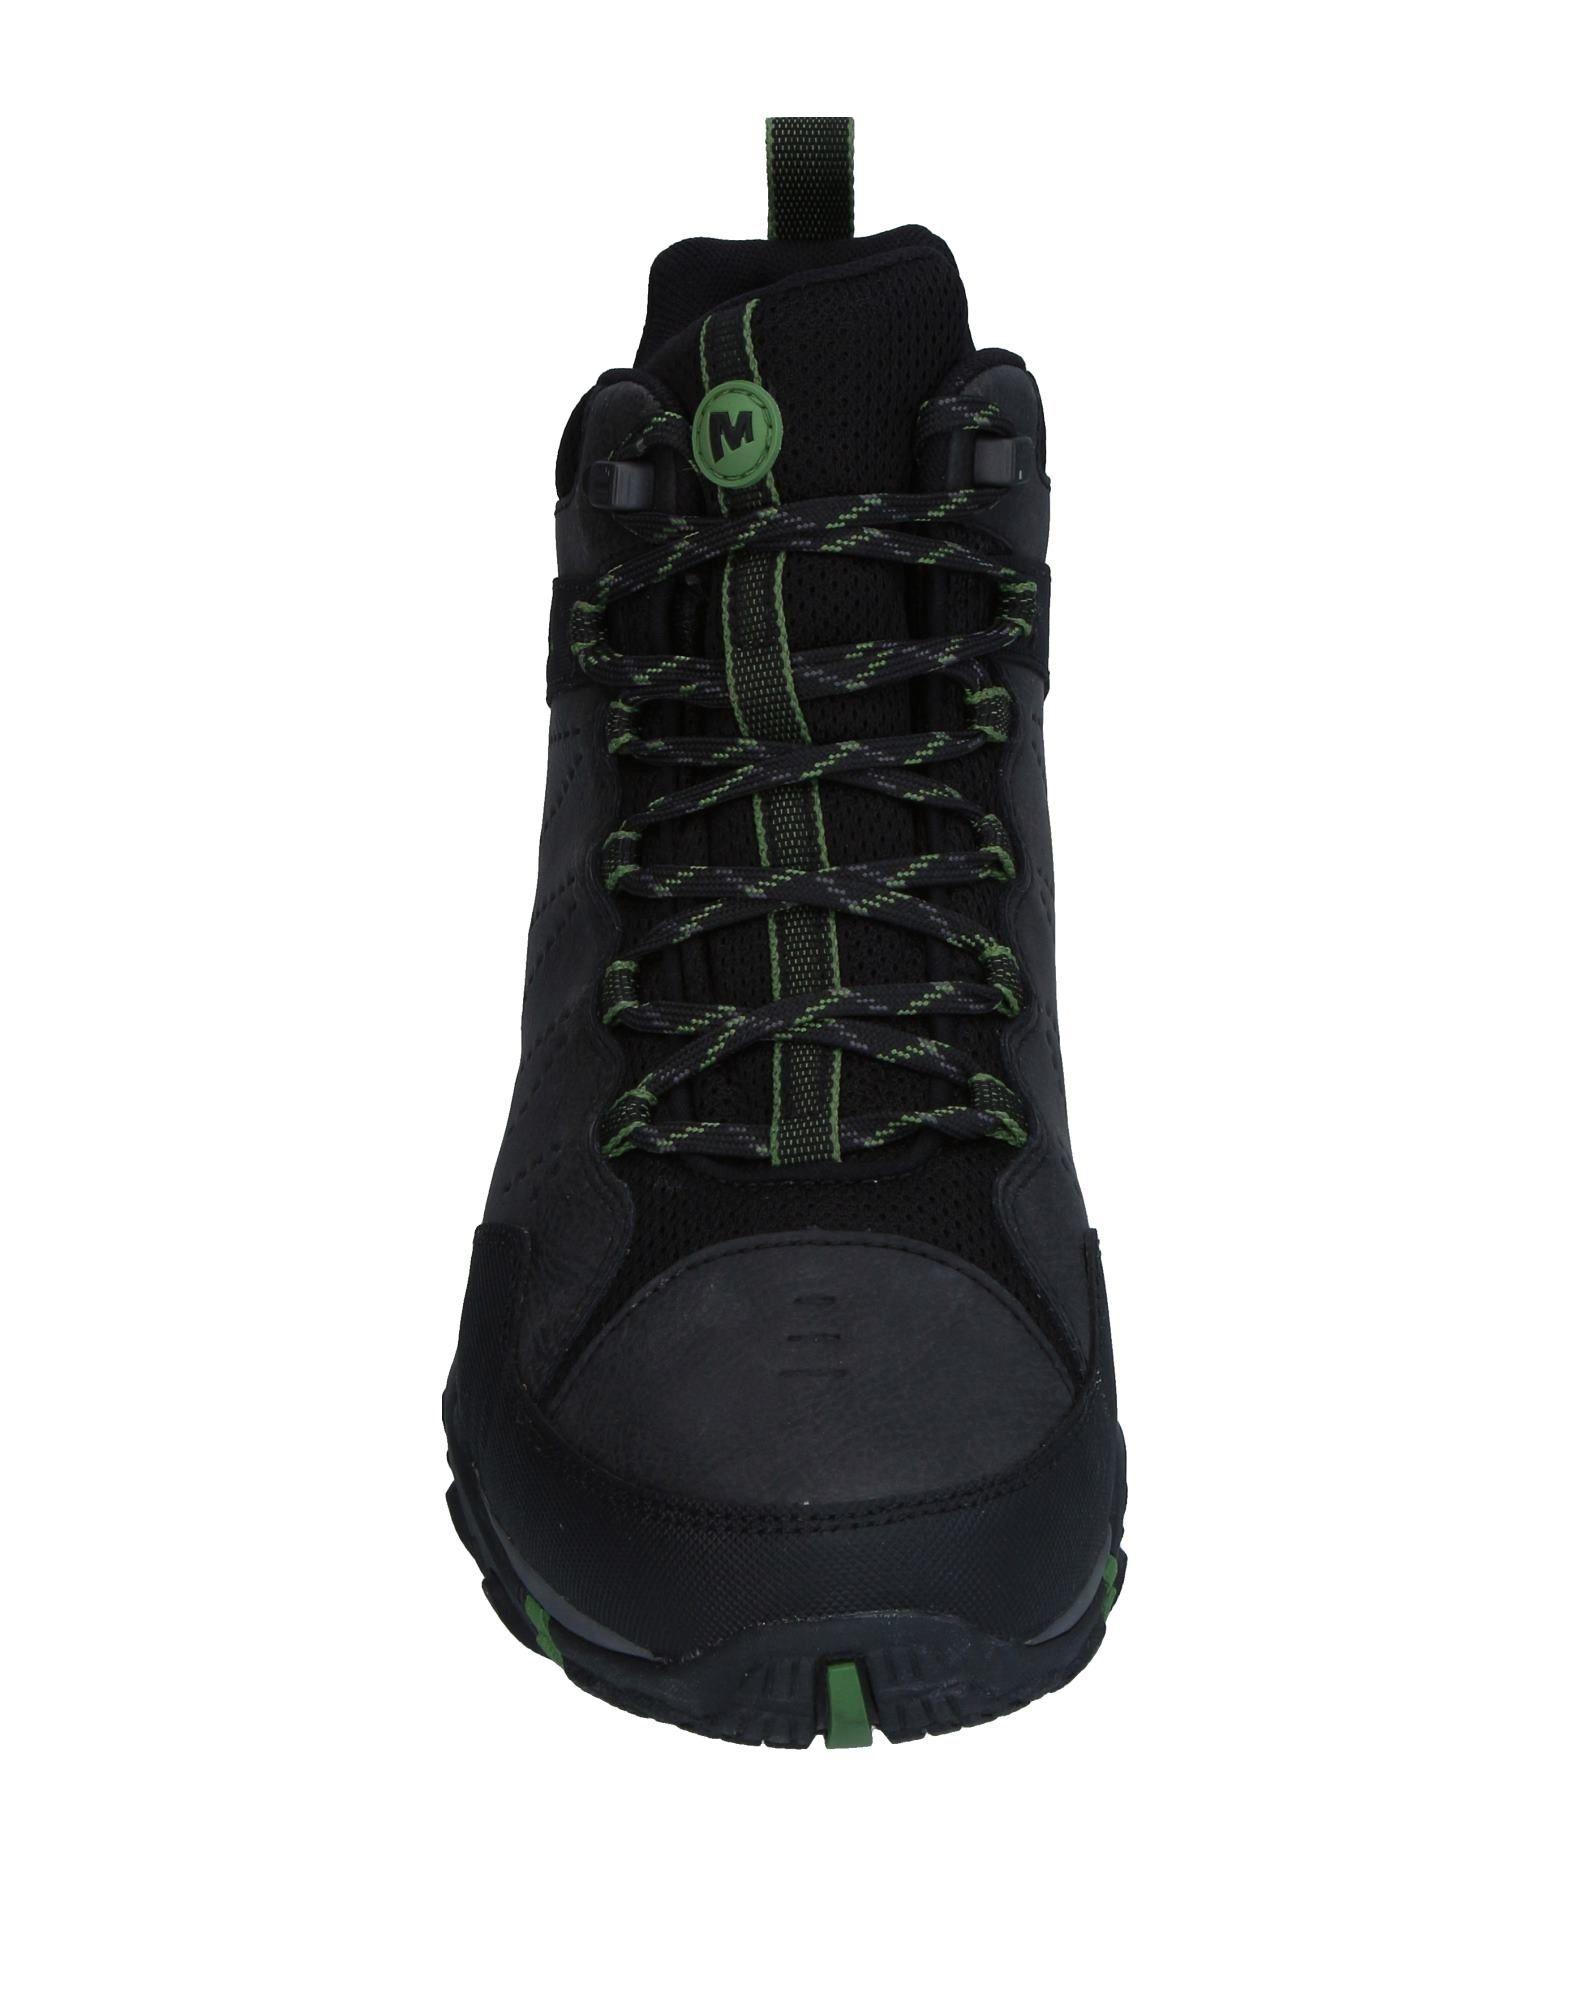 11325205JS Merrell Sneakers Herren  11325205JS  8d9d1a